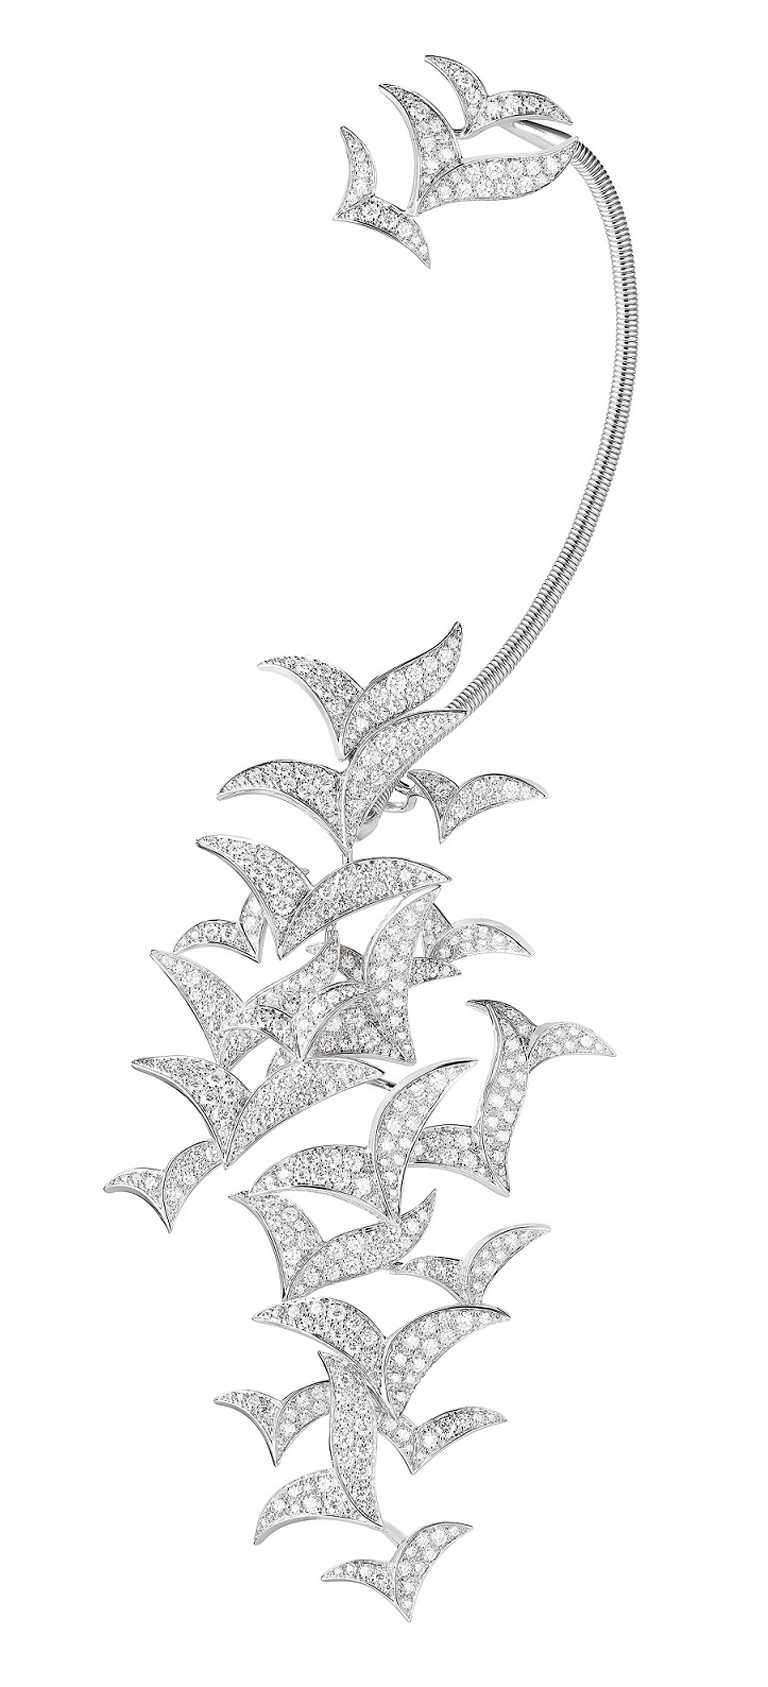 BOUCHERON「Murmuration」主題不對稱耳環,白金鑲嵌鑽石╱價格店洽。(圖╱BOUCHERON提供)